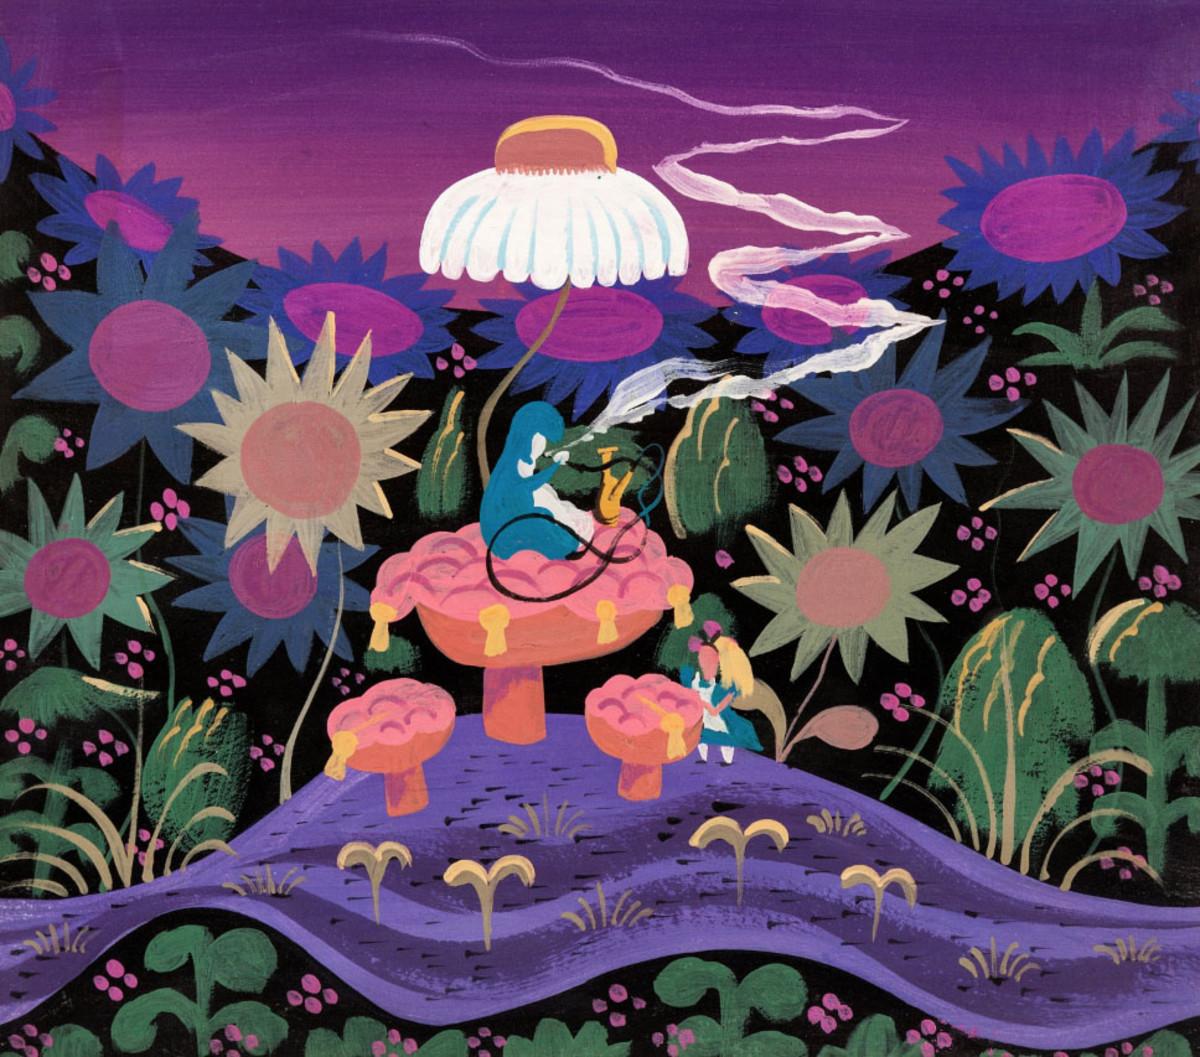 Mary Blair's Alice in Wonderland